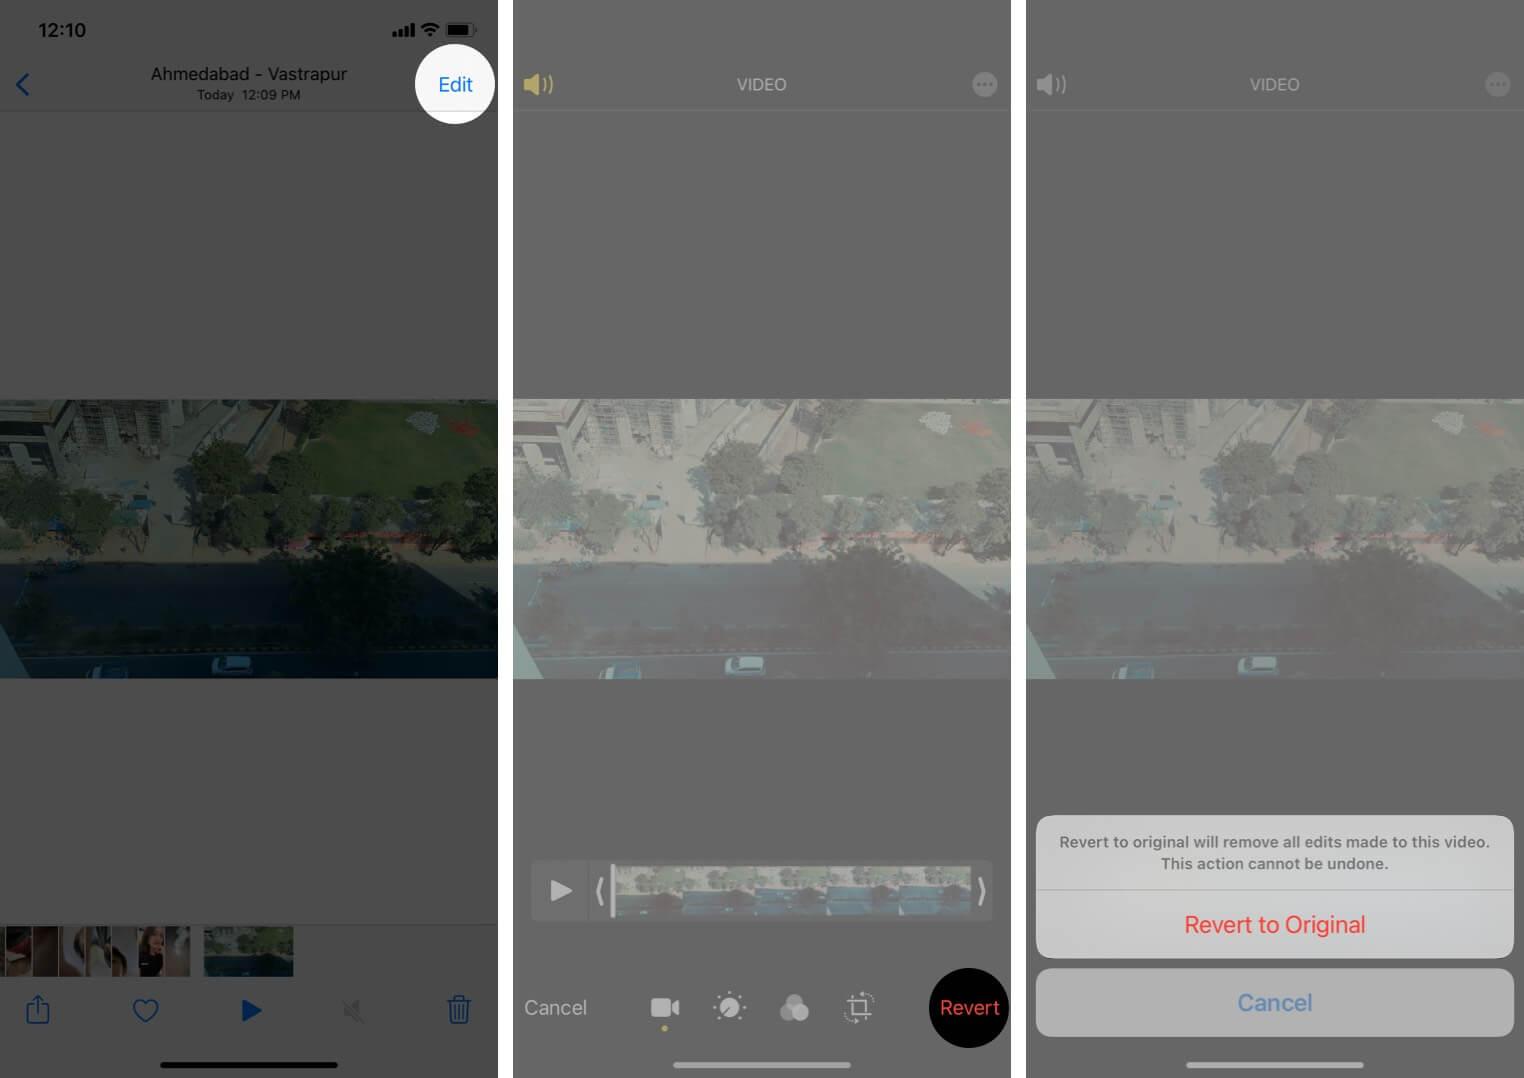 Undo Filter Applied on Video on iPhone